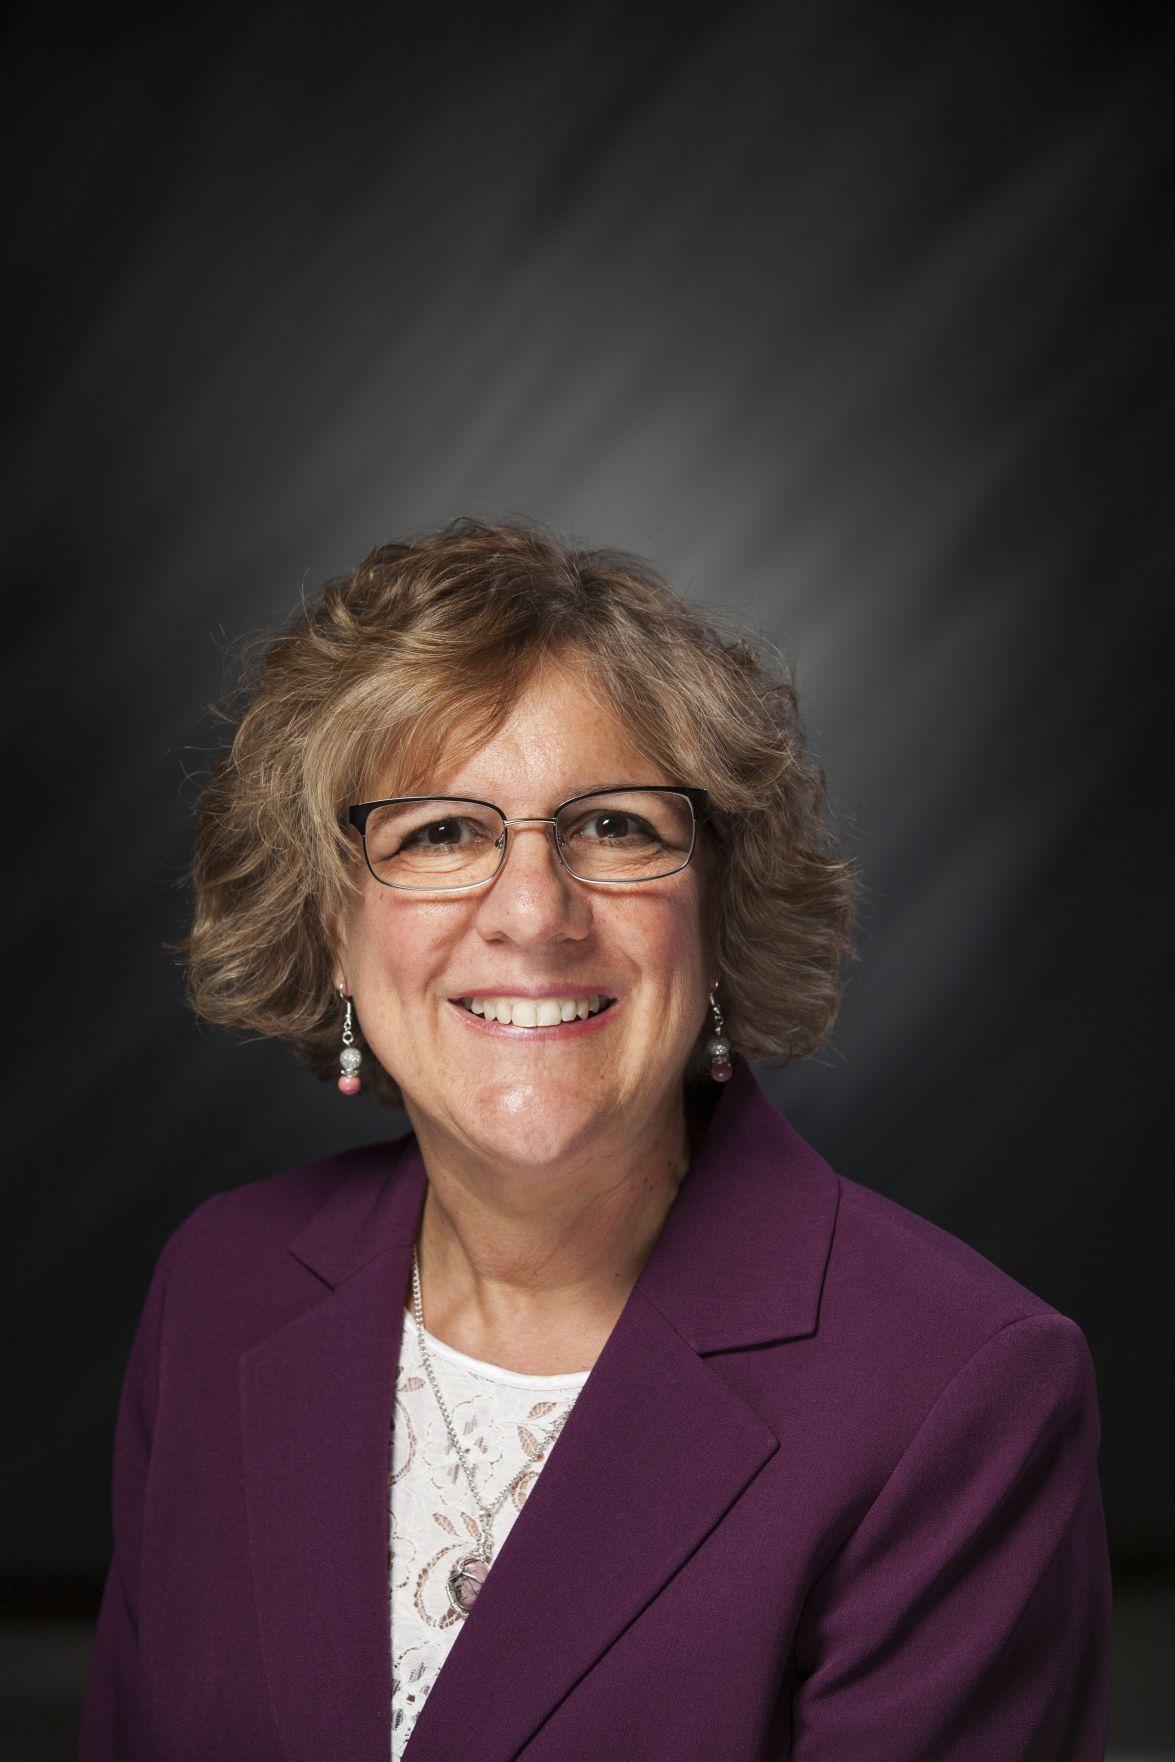 State Rep. Julie Olthoff